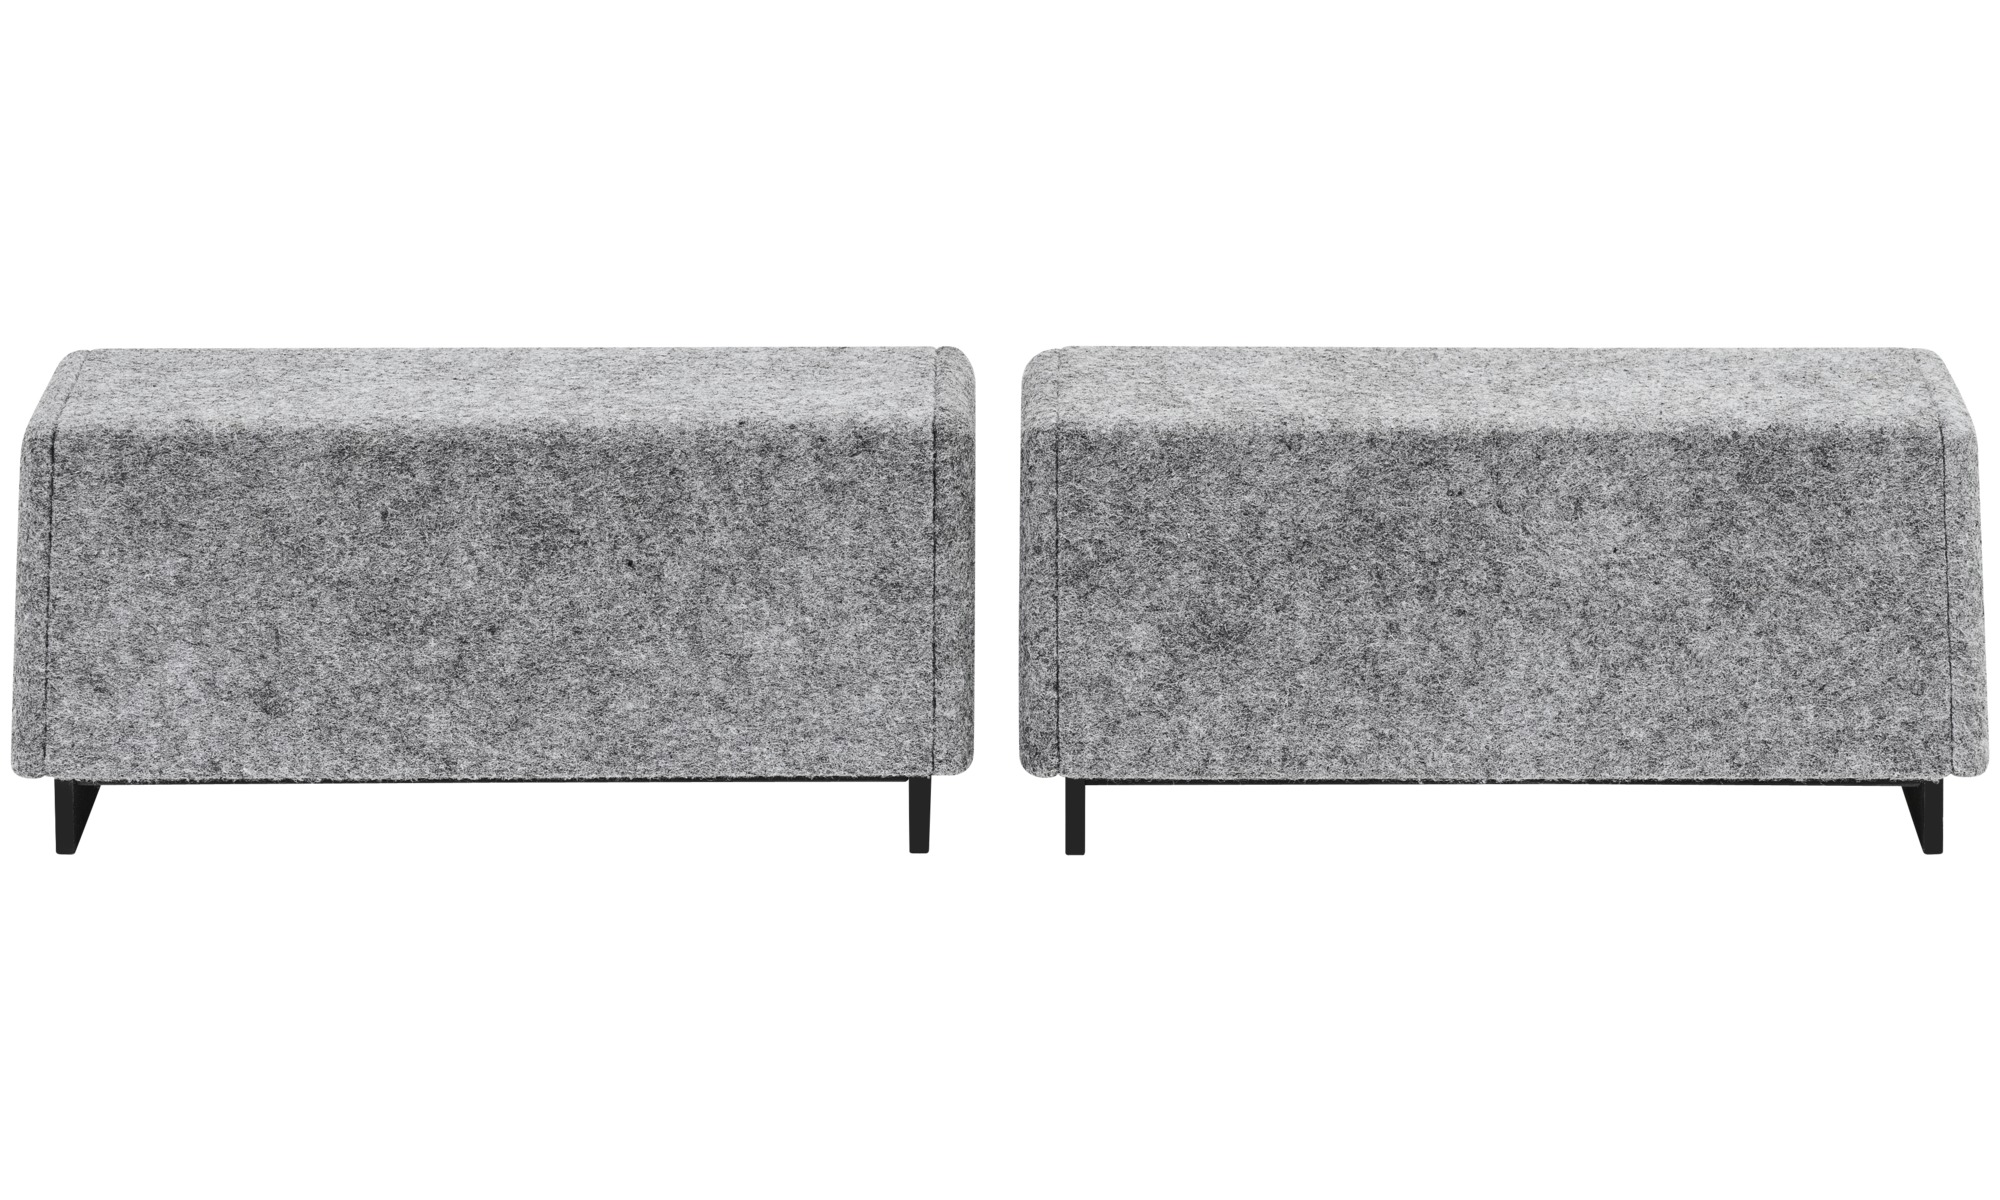 Desks - Cupertino loudspeakers (set) - Gray - Speaker front